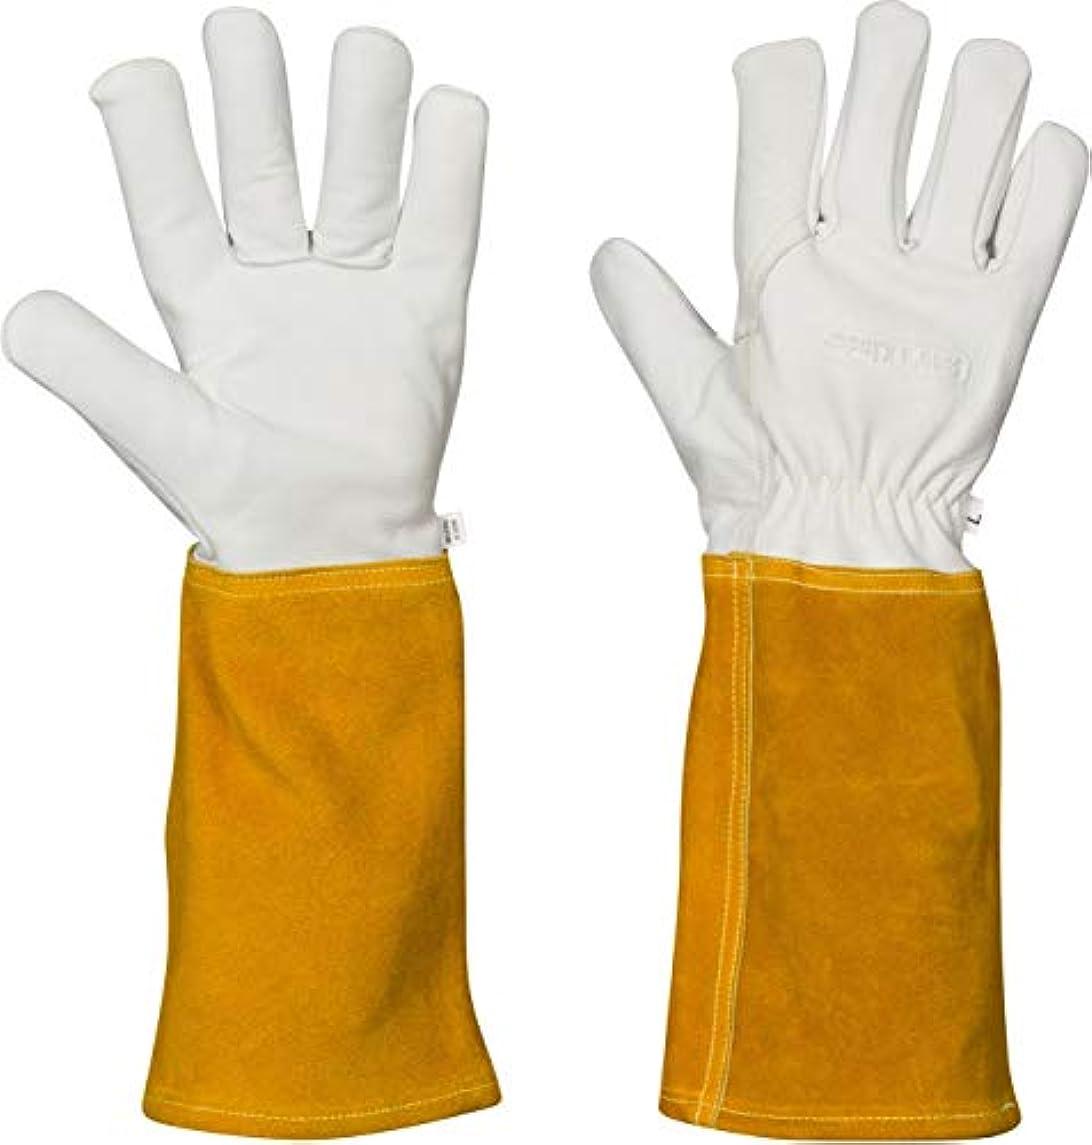 Forging Gloves Heat Fire Resistant Welding Glove XL for Fireplace, Furnace, Stove, Pot Holder, Tig, Blacksmith, Animal Handling: Leather Kevlar Welders (Extra Large)